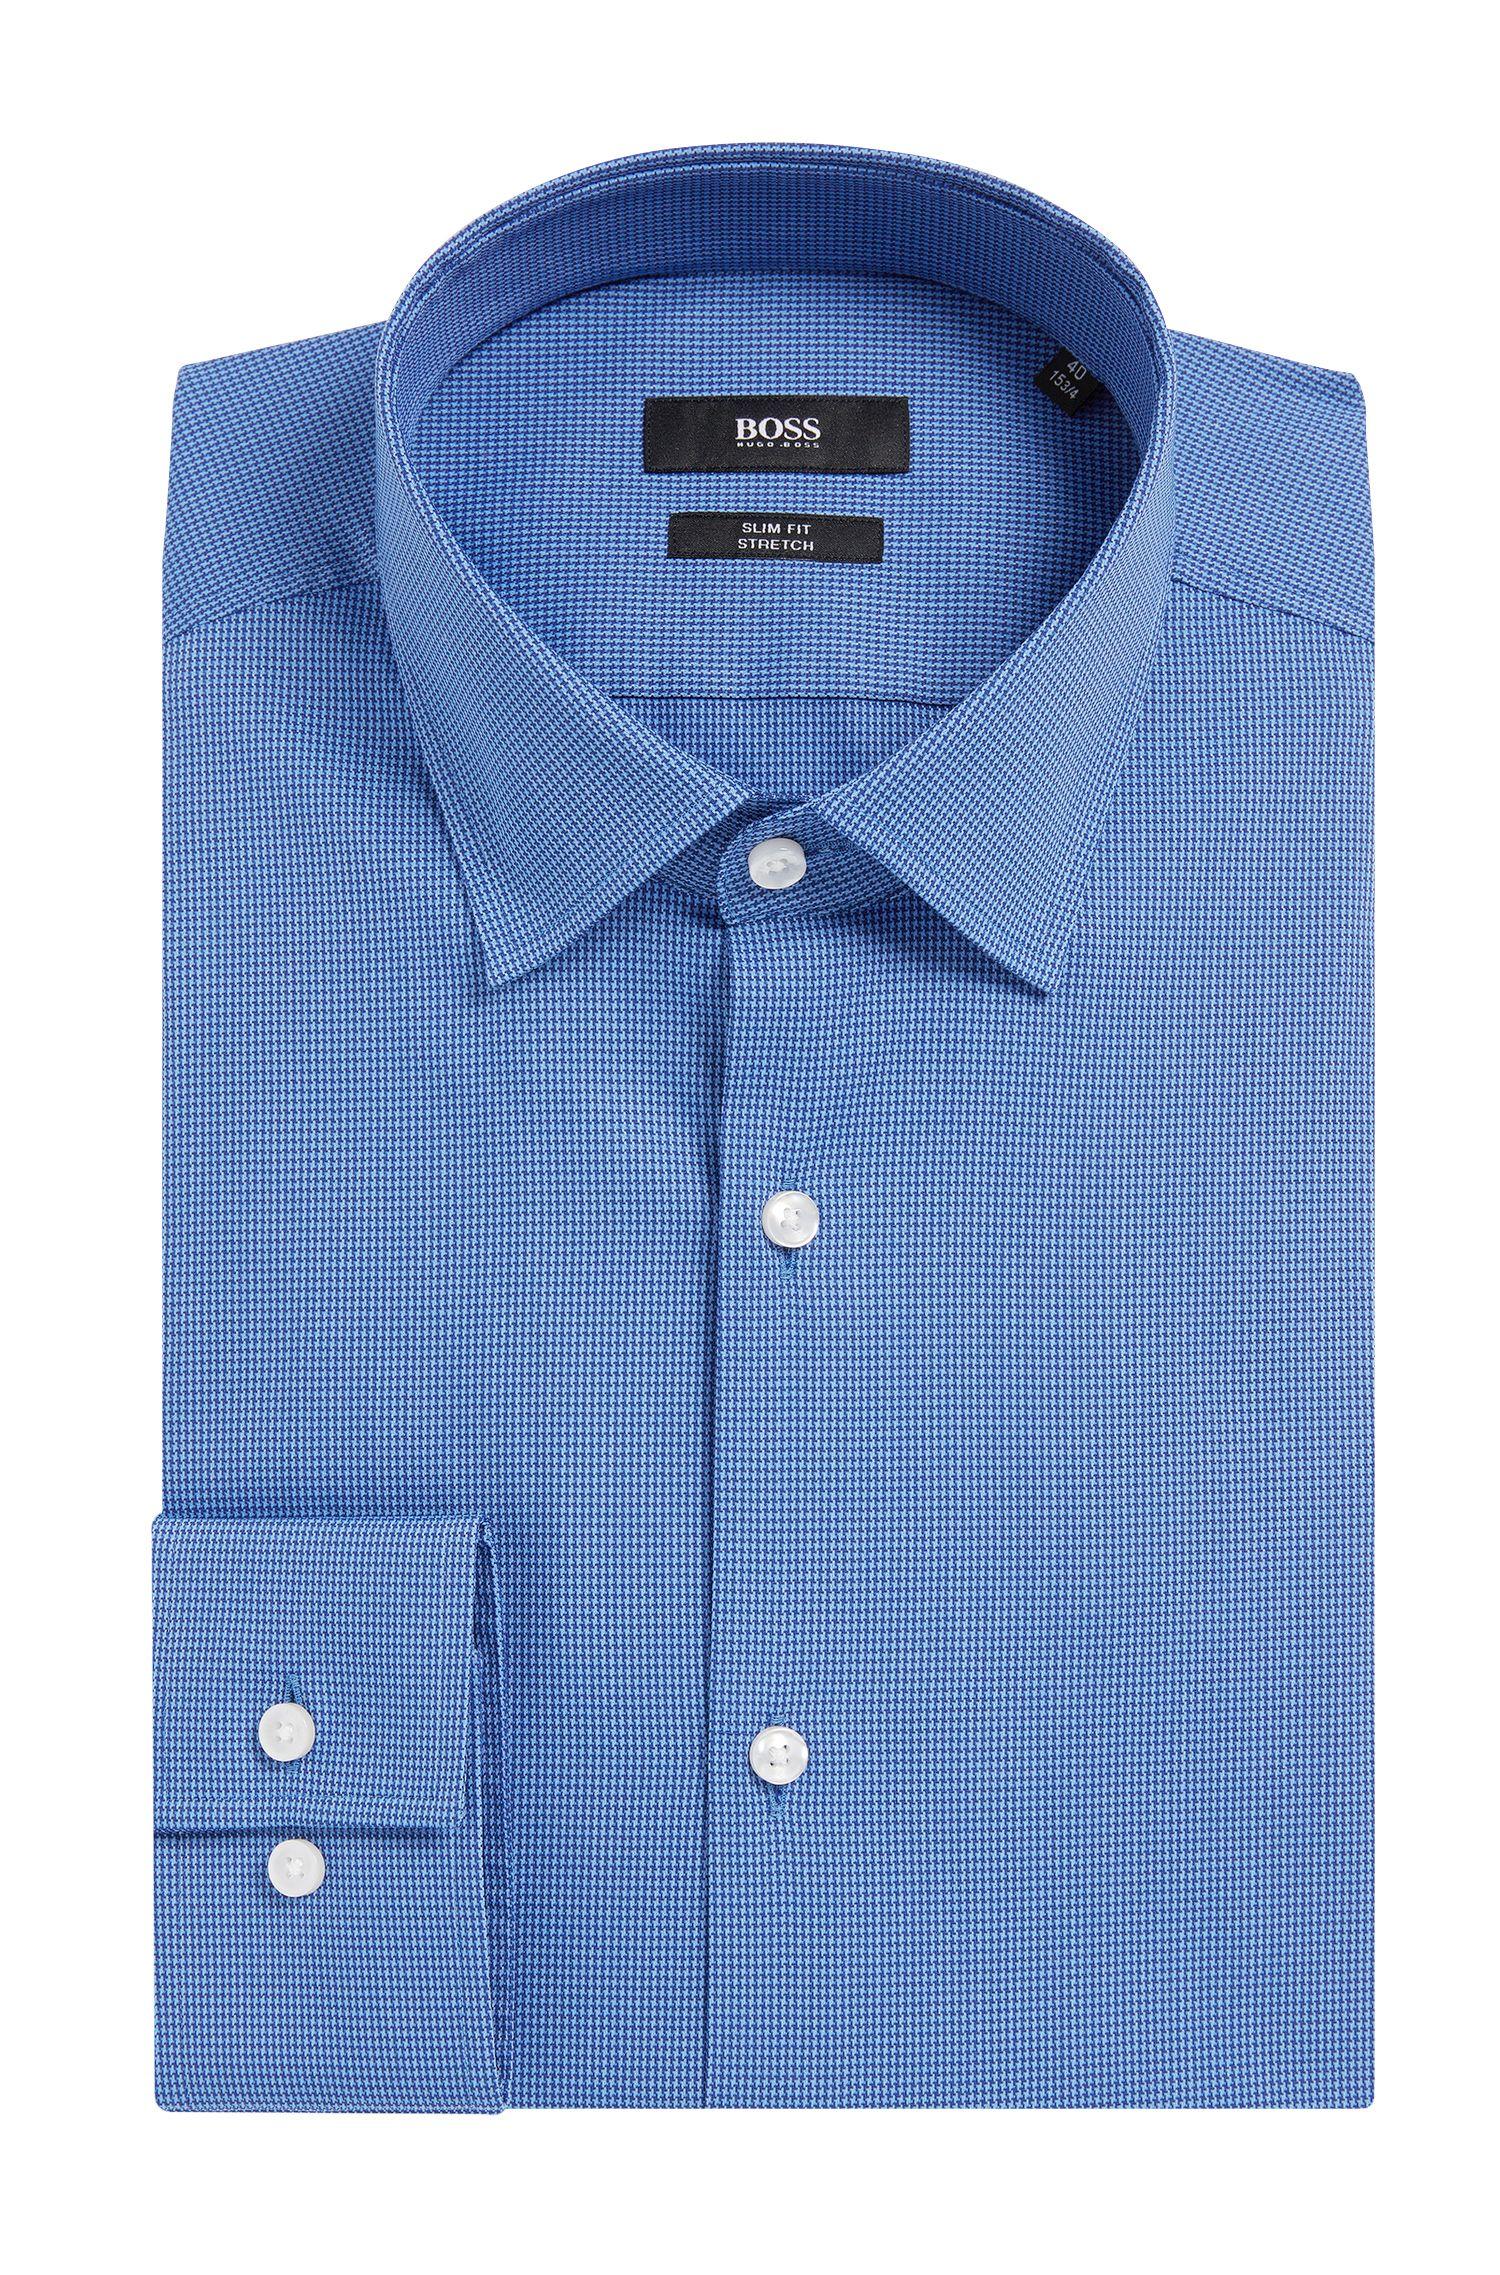 Houndstooth Stretch Cotton Dress Shirt, Slim Fit | Jenno